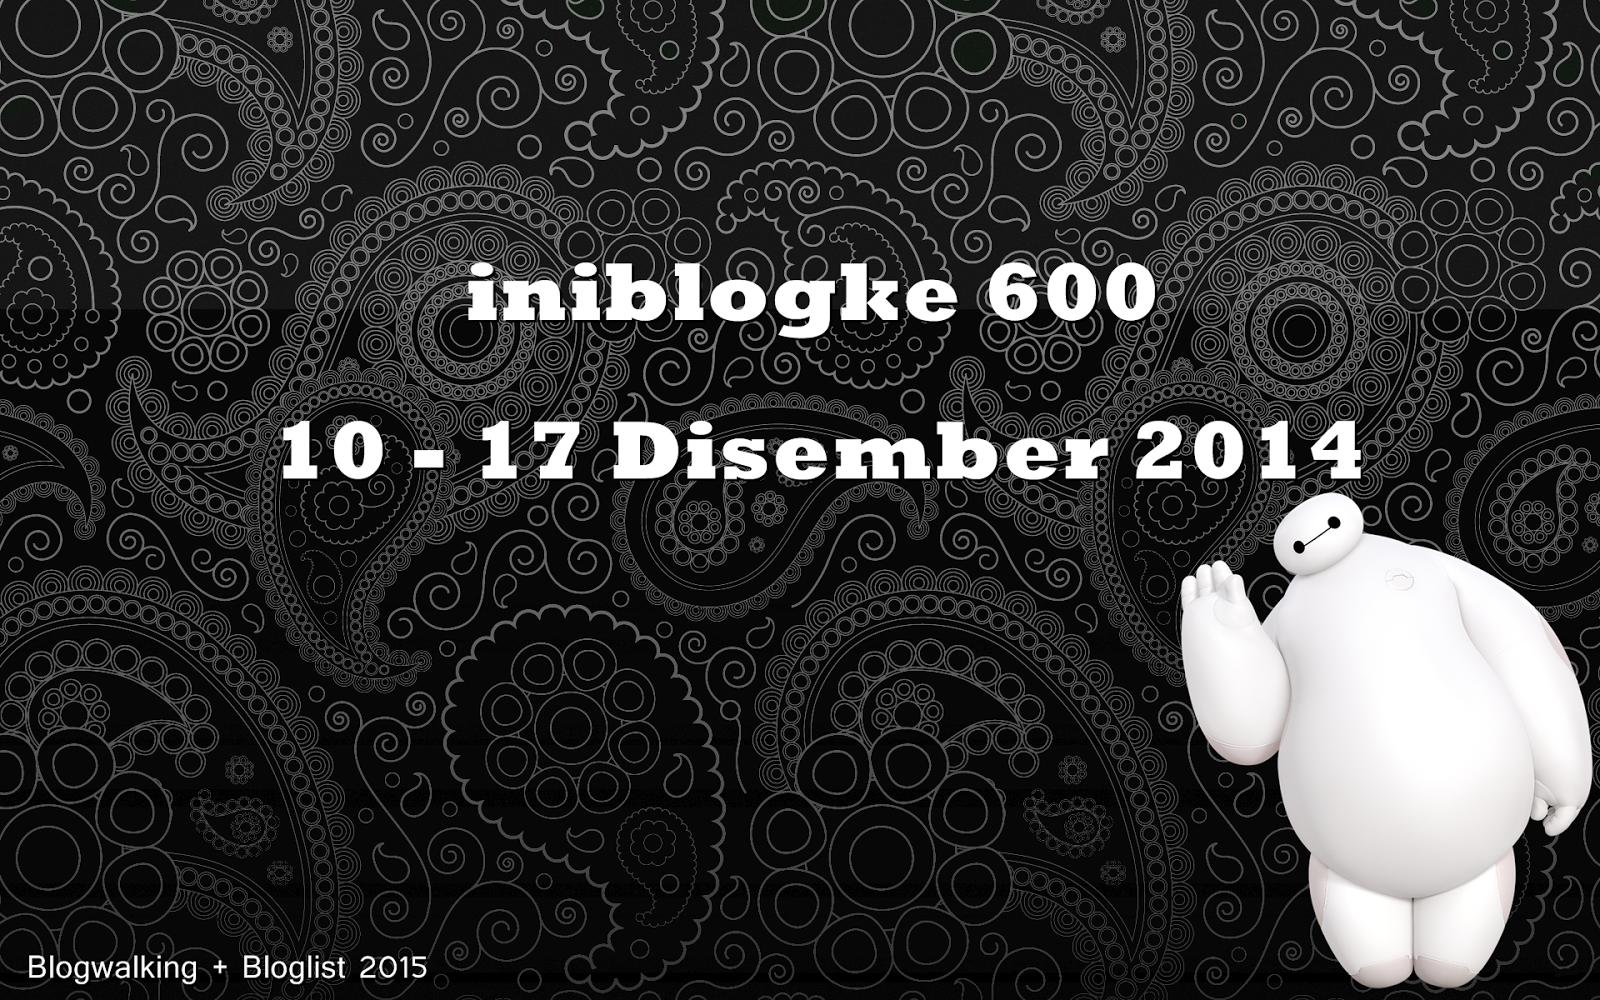 http://iniblogke.blogspot.com/2014/12/iniblogke-600-bloglist.html#.VIm1r8mS0tN